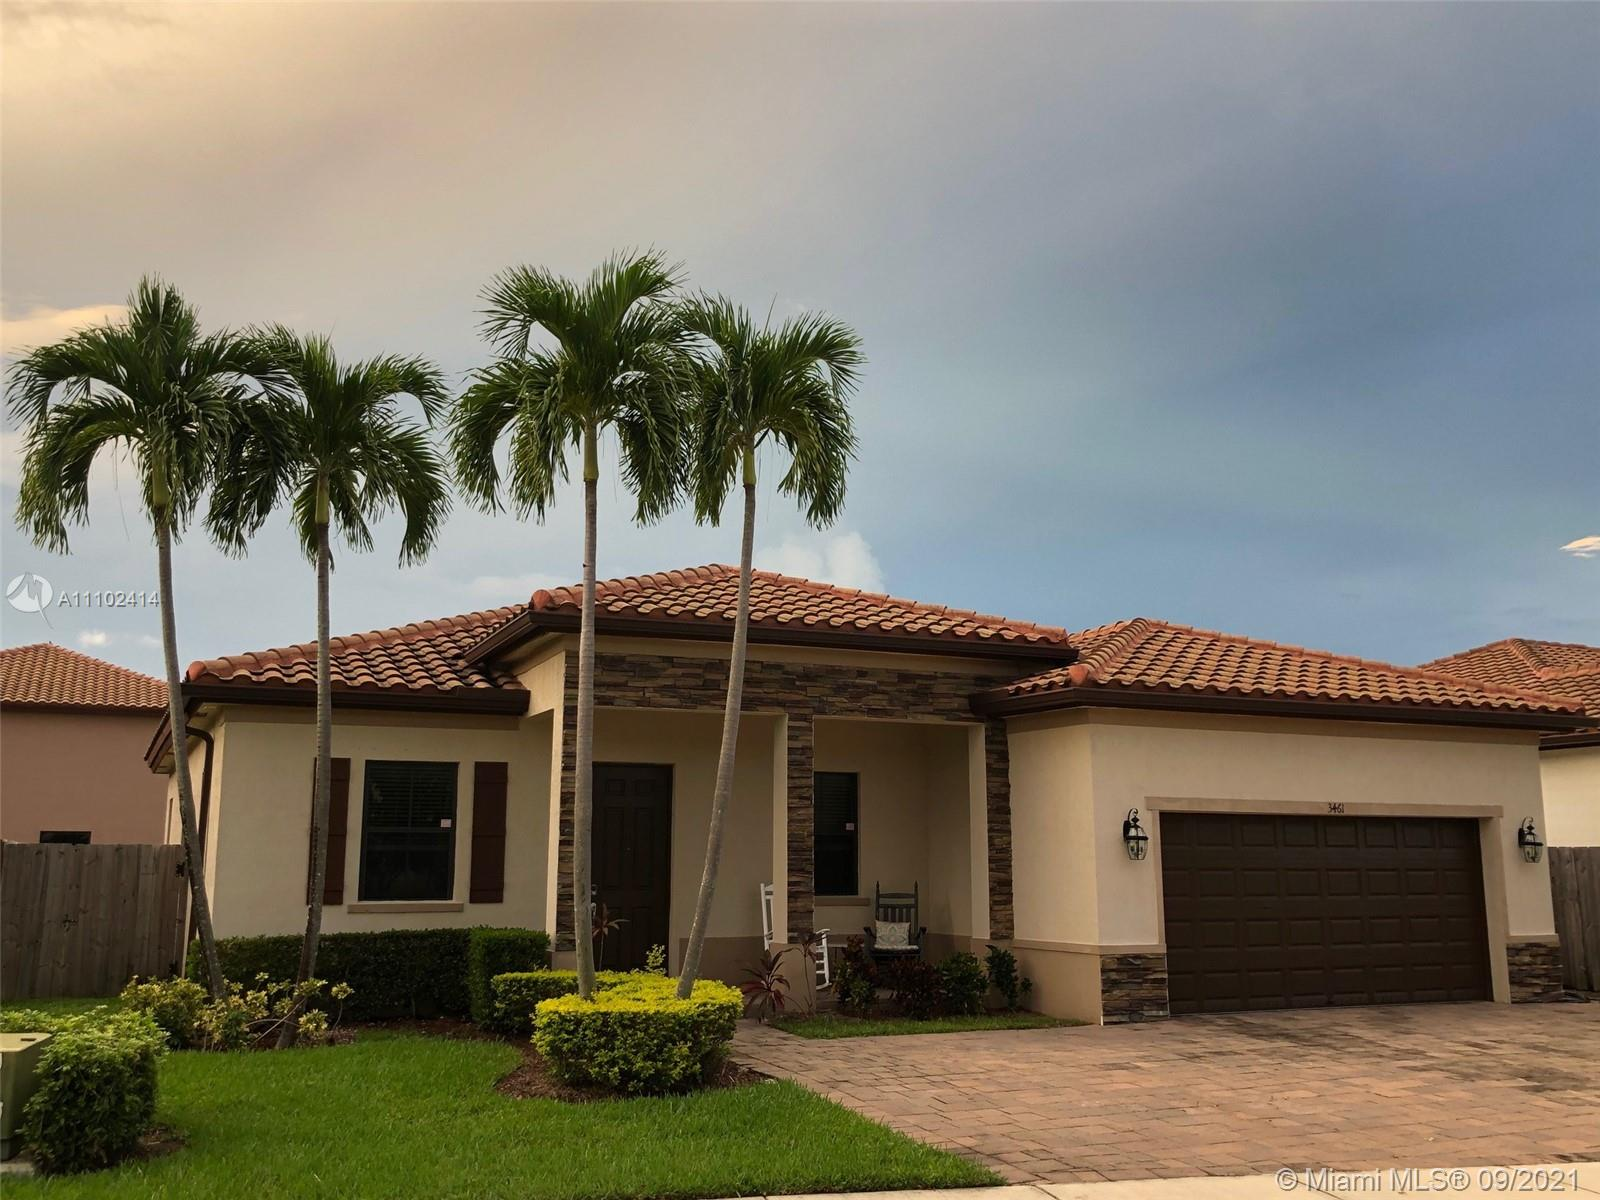 Single Family Home For Sale Vineyards2,043 Sqft